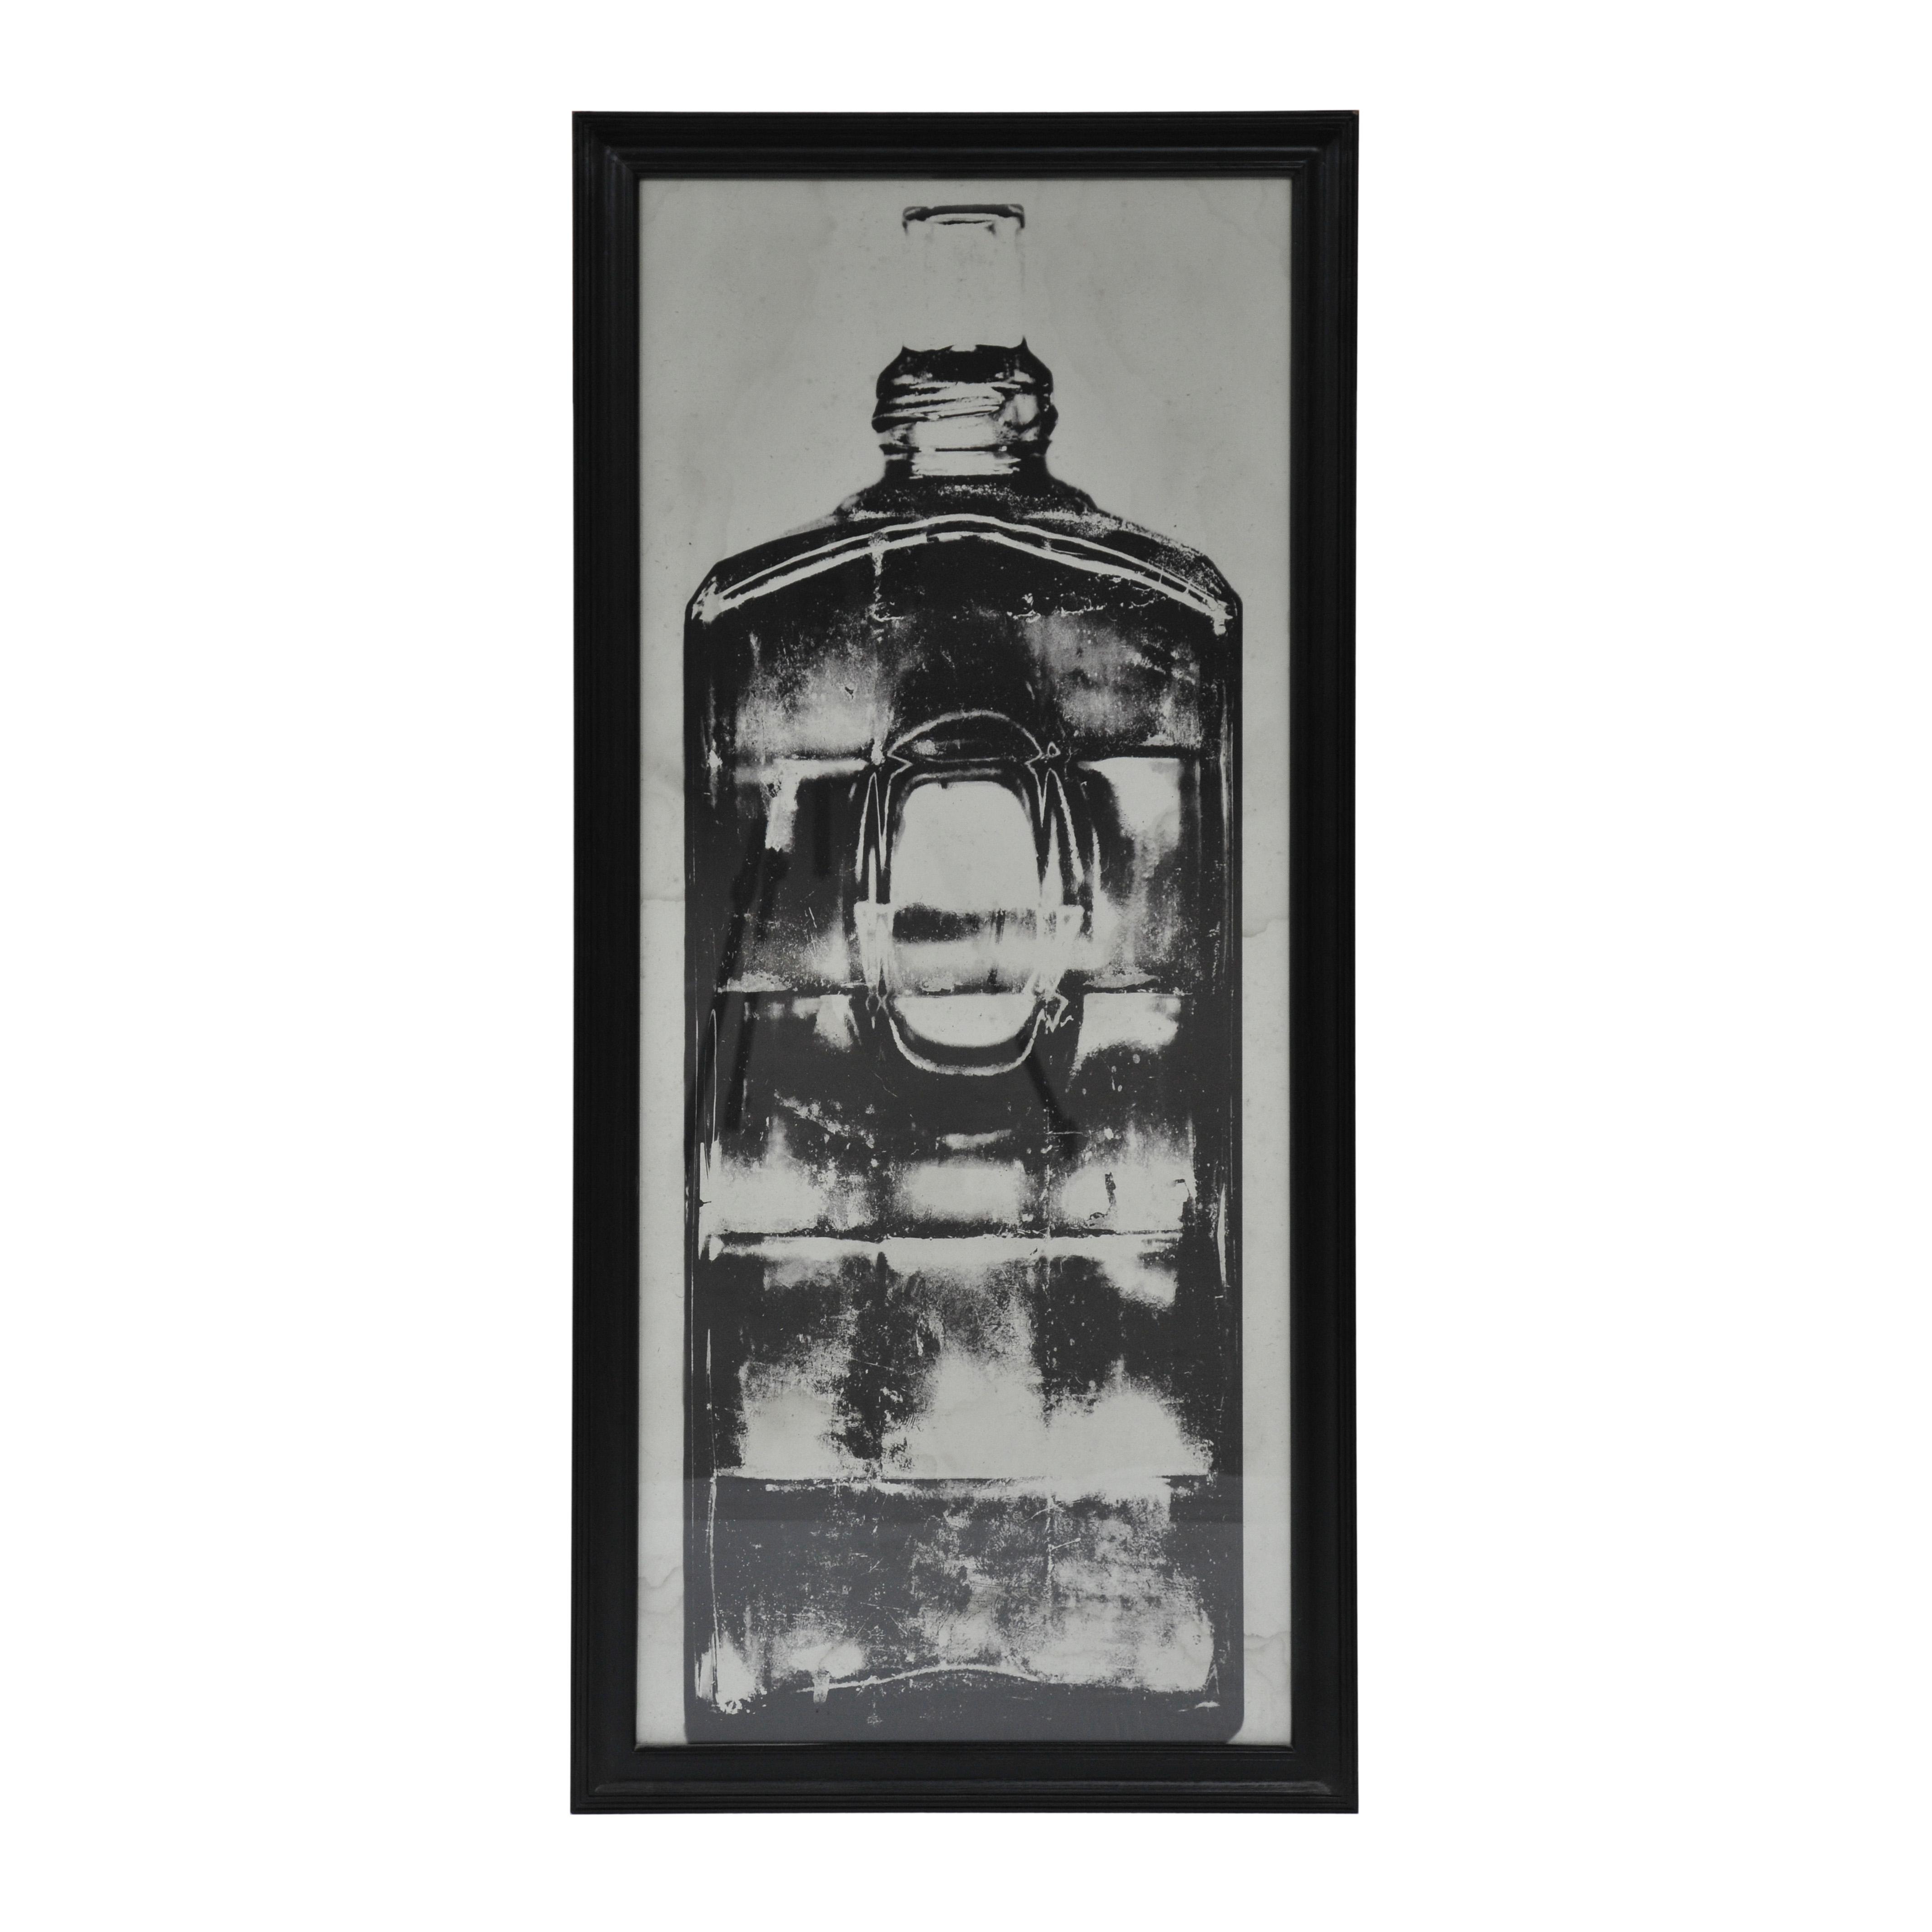 Lot 58 - Graphics Copper Bottle Art Work 3 in Black Wood Frame 59 X 3 X 130 5cm